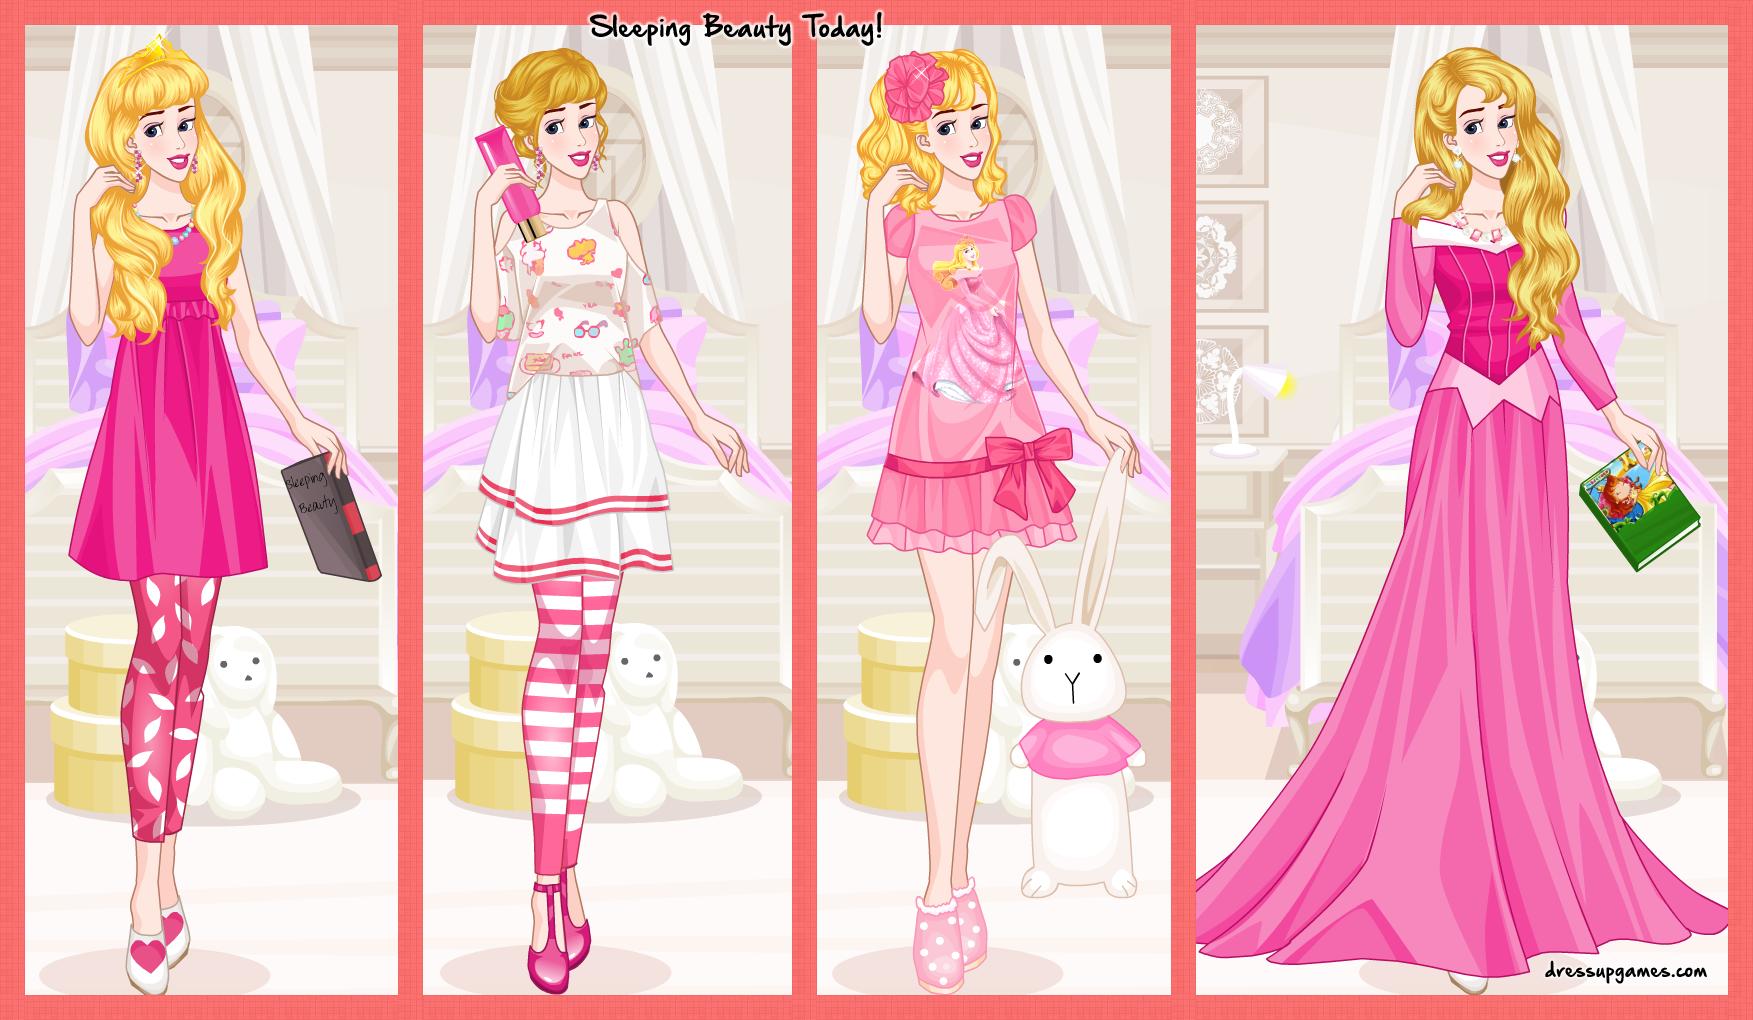 Sleeping Beauty Today by DressUpGamescom on DeviantArt